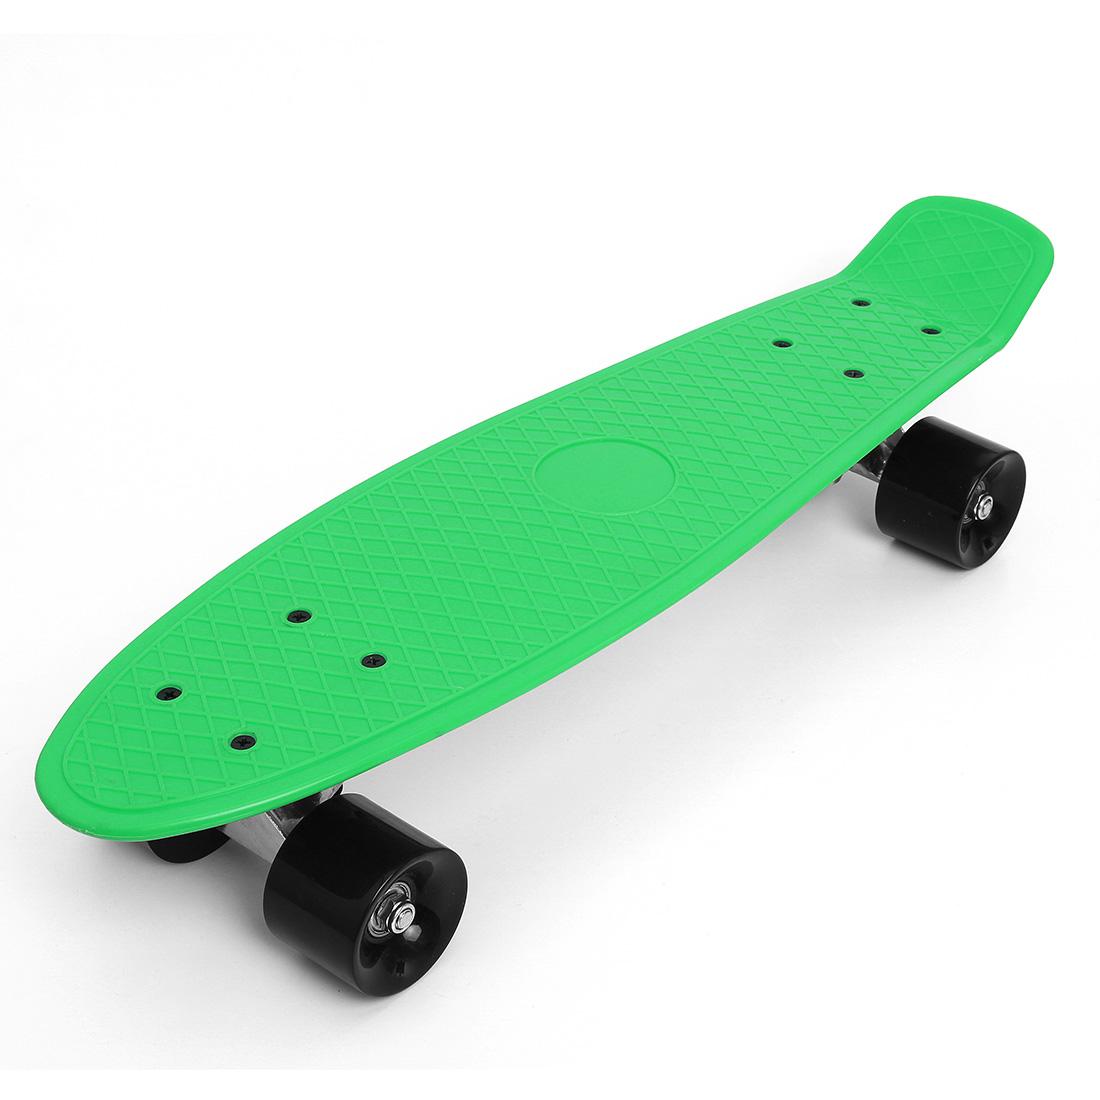 22 zoll retro skate longboard skateboard komplett street penny mini cruiser neu ebay. Black Bedroom Furniture Sets. Home Design Ideas